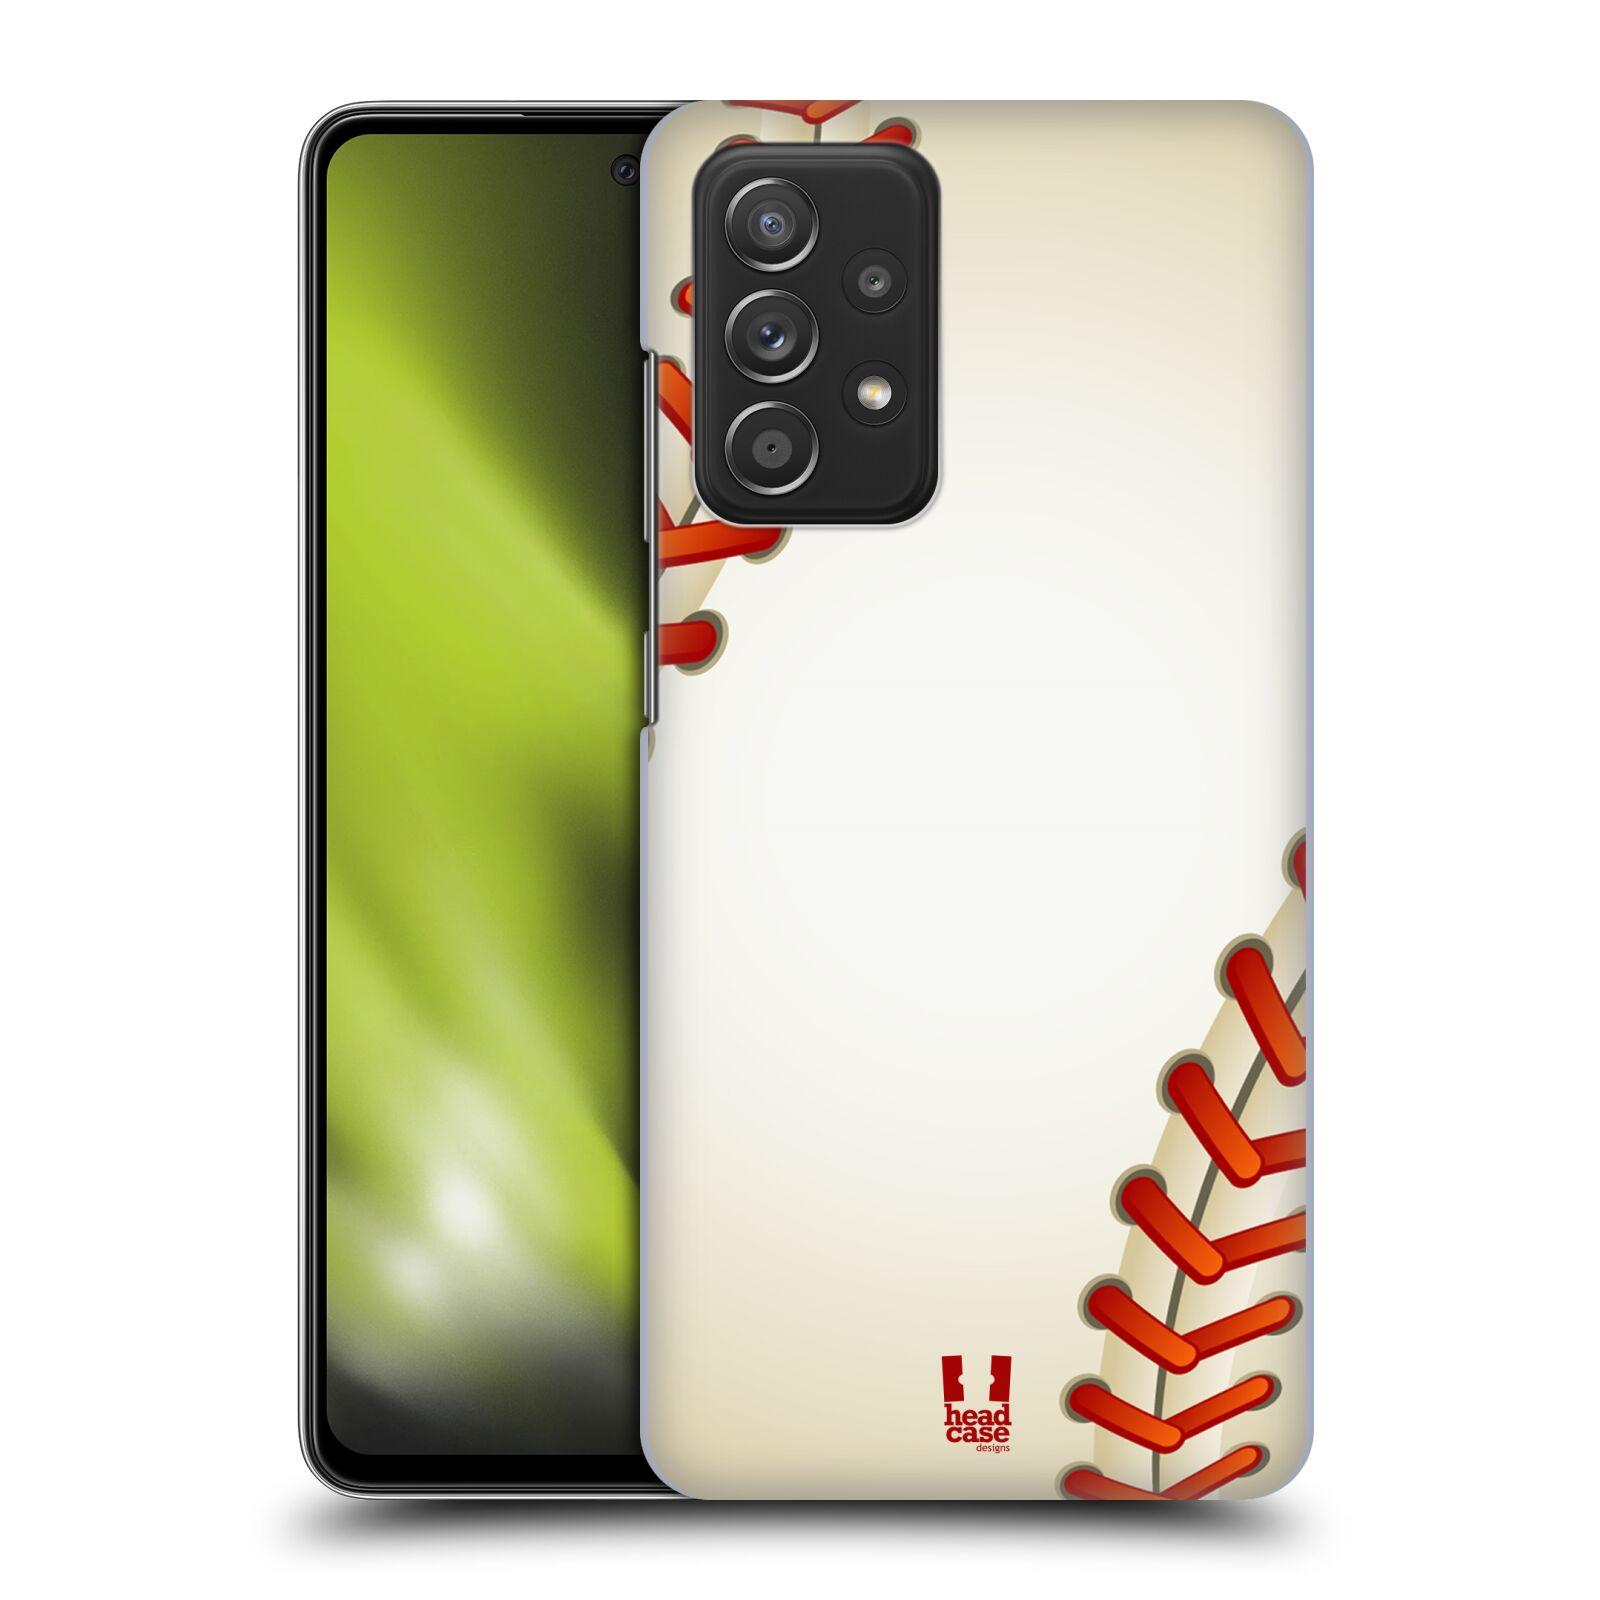 Plastové pouzdro na mobil Samsung Galaxy A52 / A52 5G / A52s 5G - Head Case - Baseballový míček